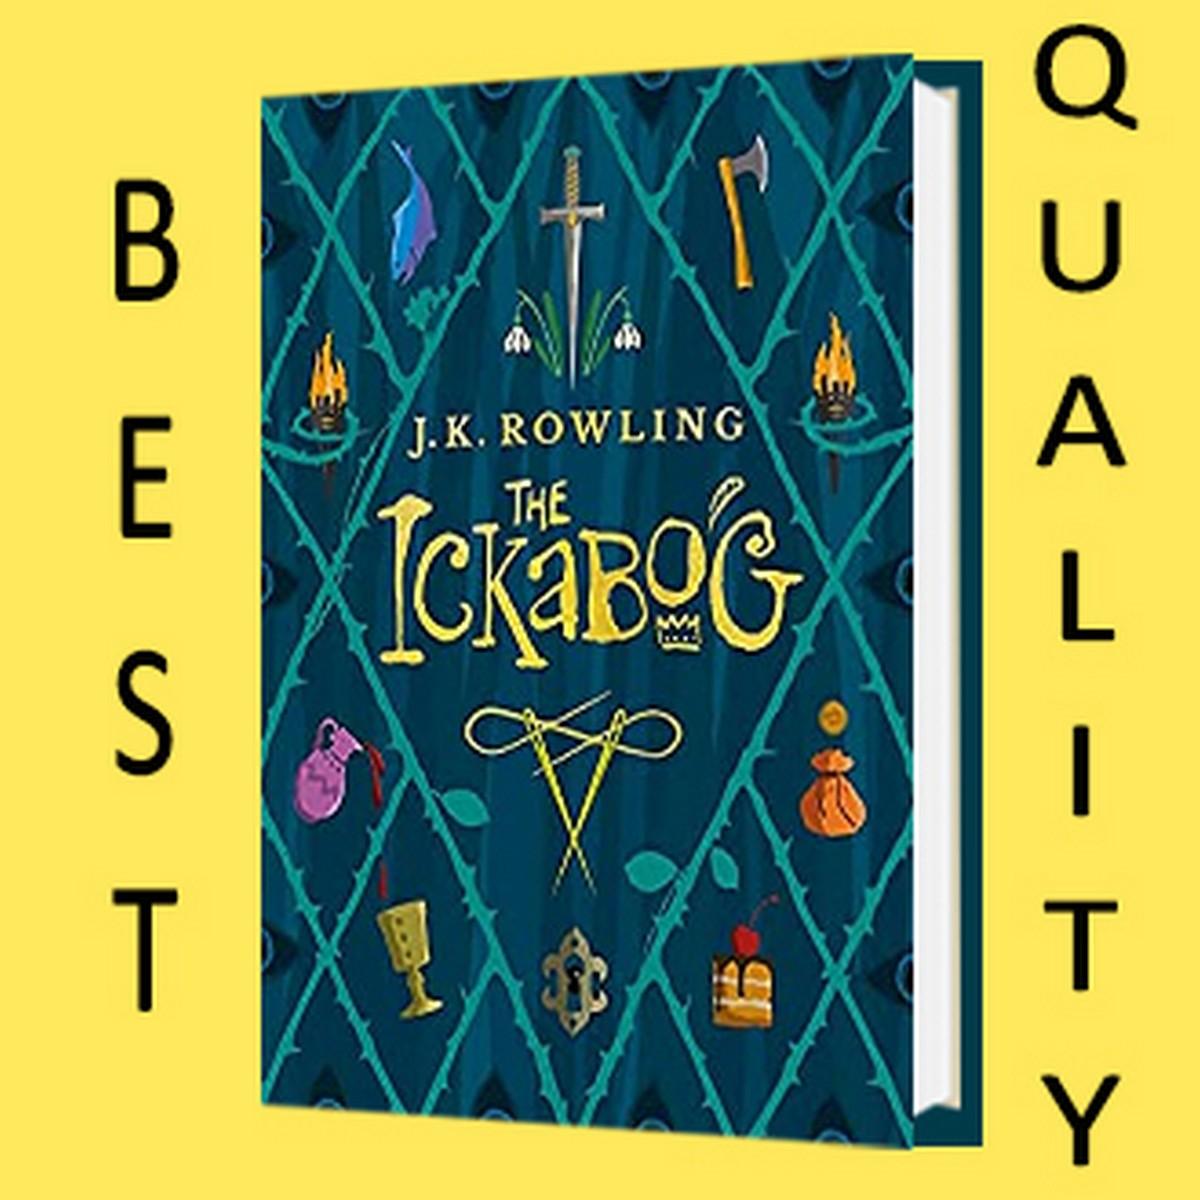 The Ickabog by J/K. Rowling